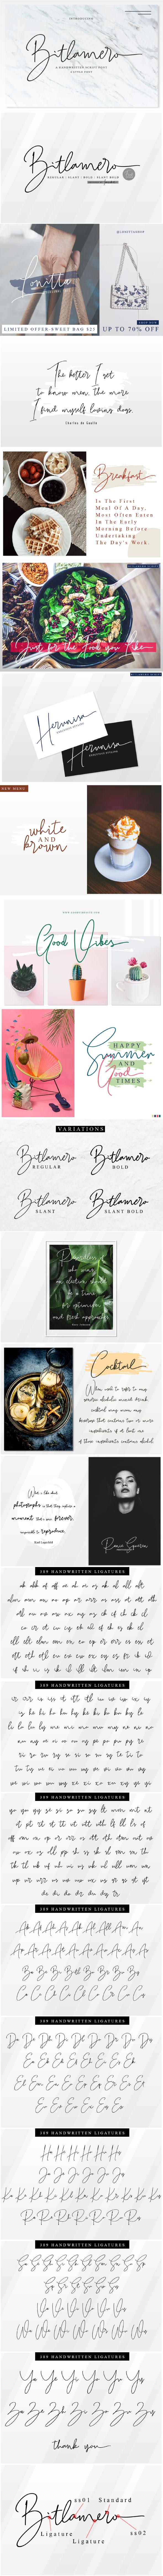 4 Style Font - Bitlamero Script - Calligraphy Script